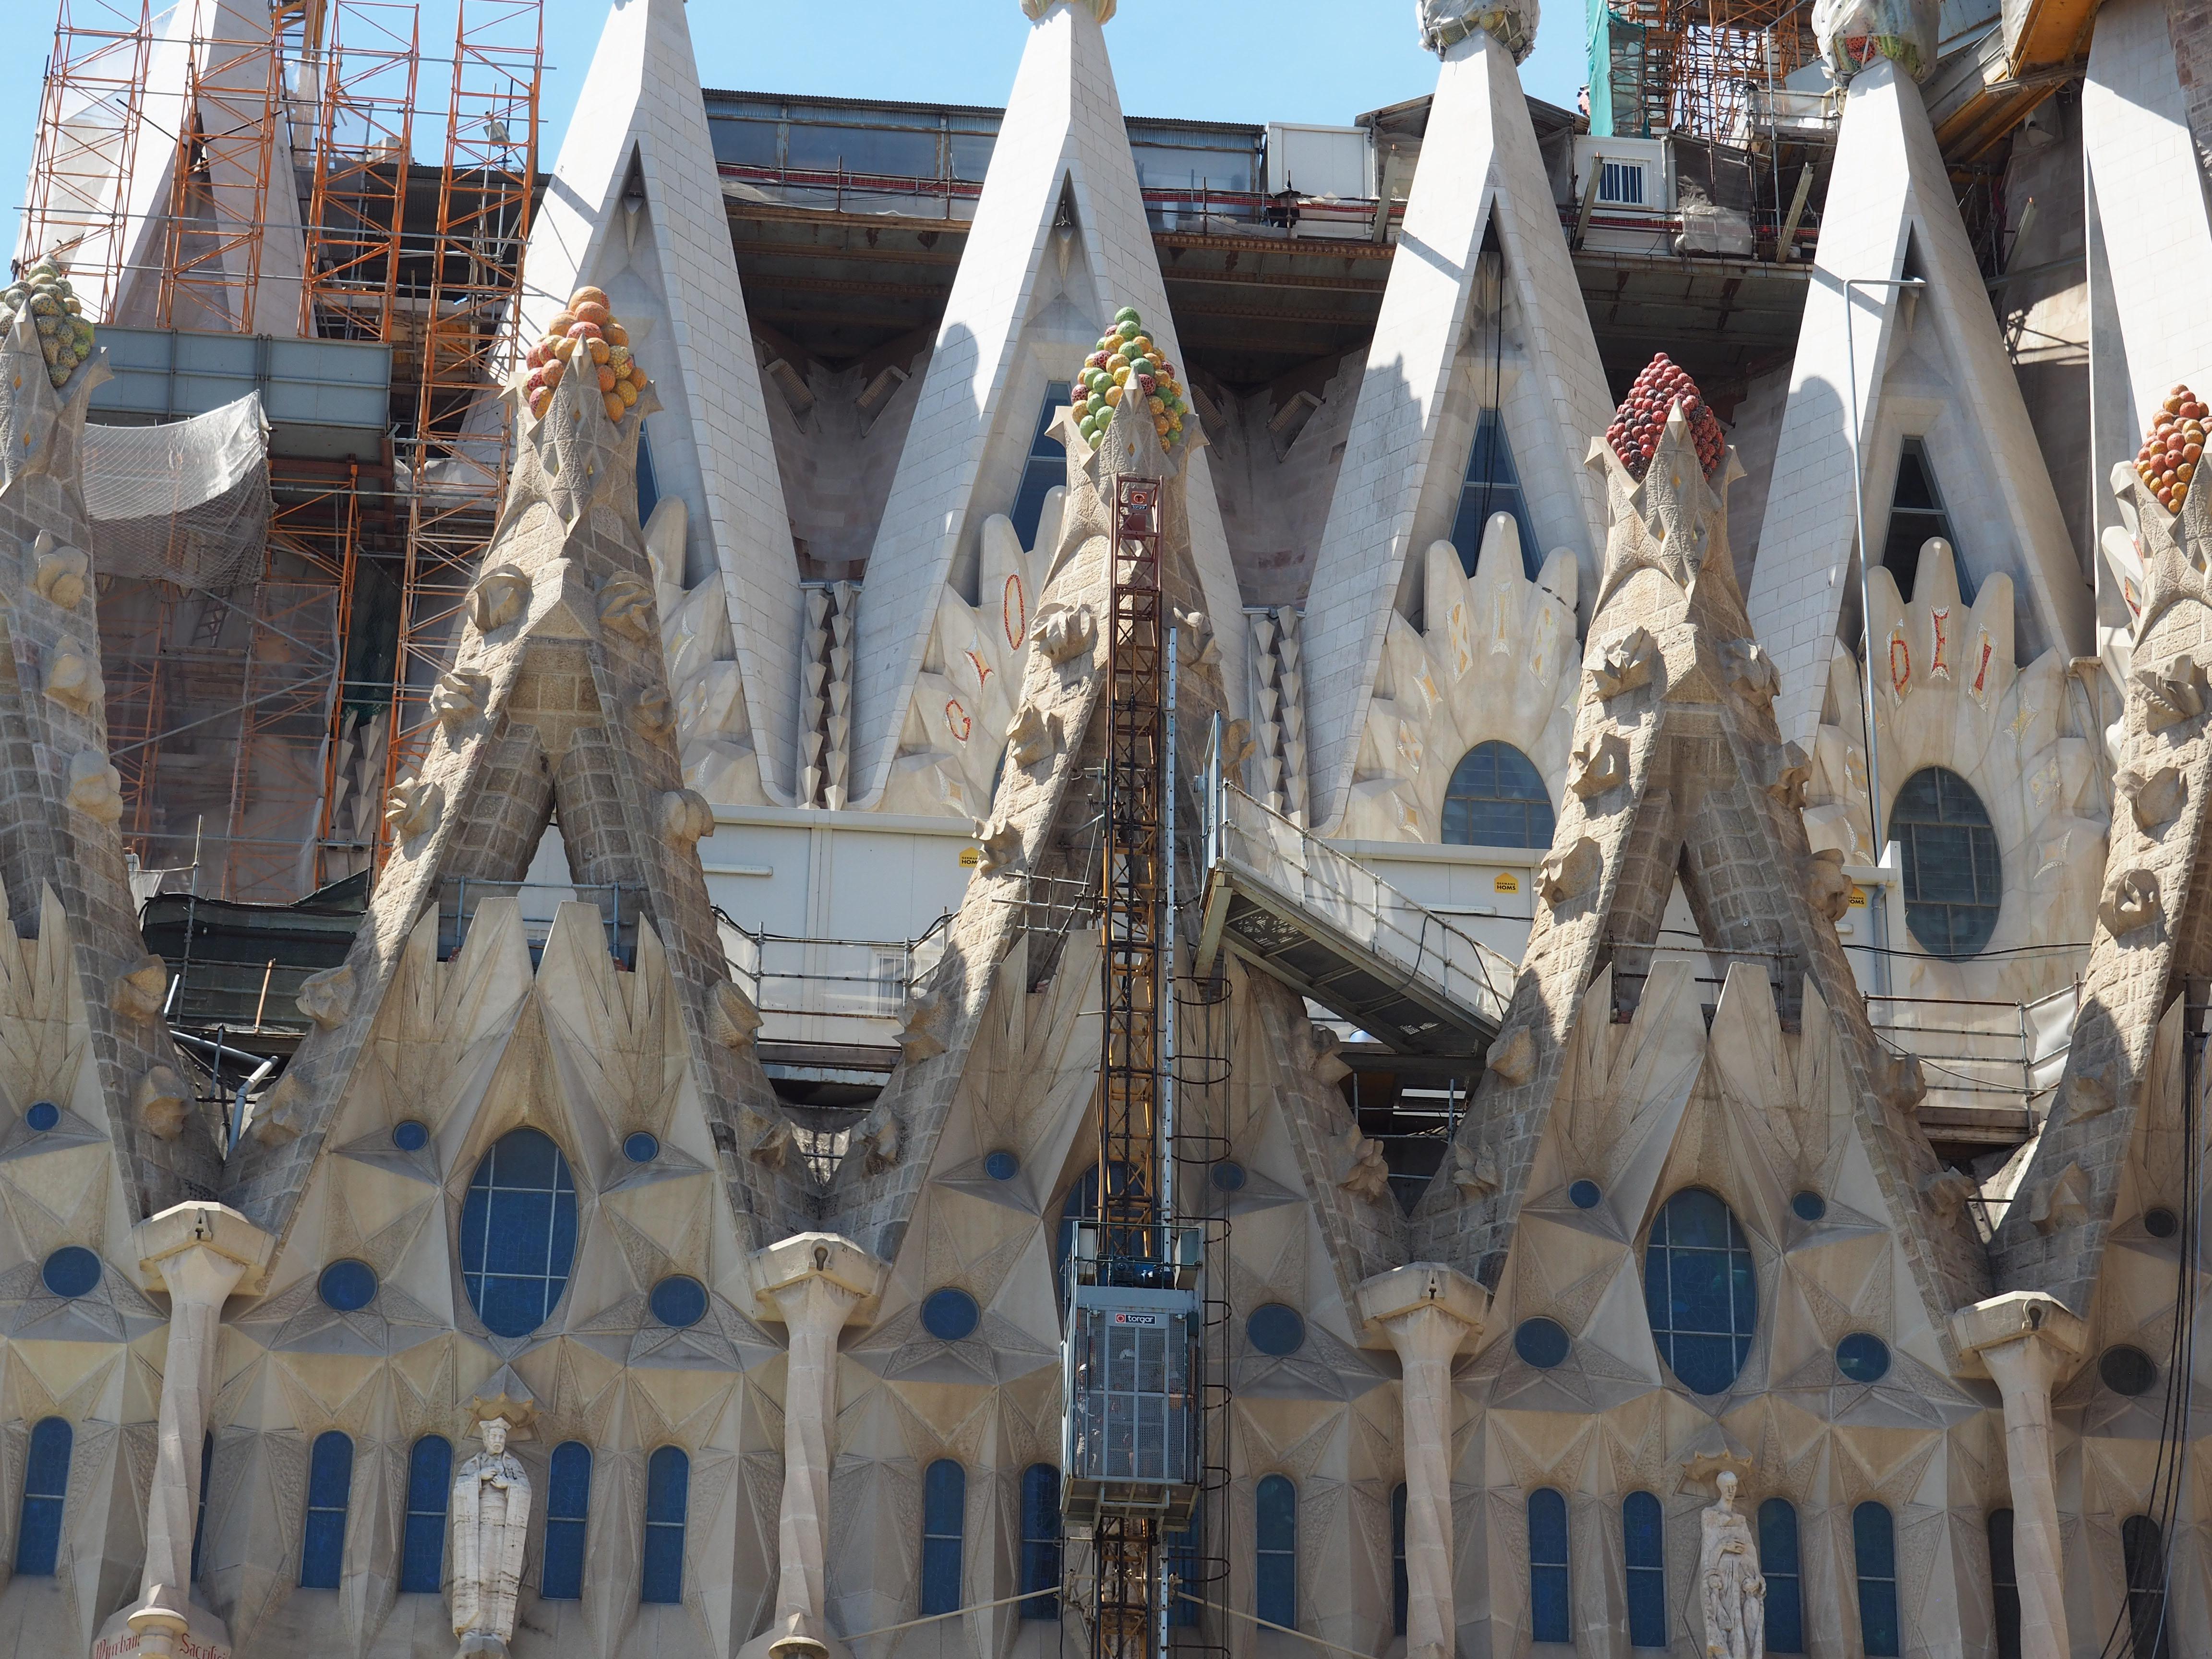 Fassadenausschnitt der Sagrada Familia in Barcelona